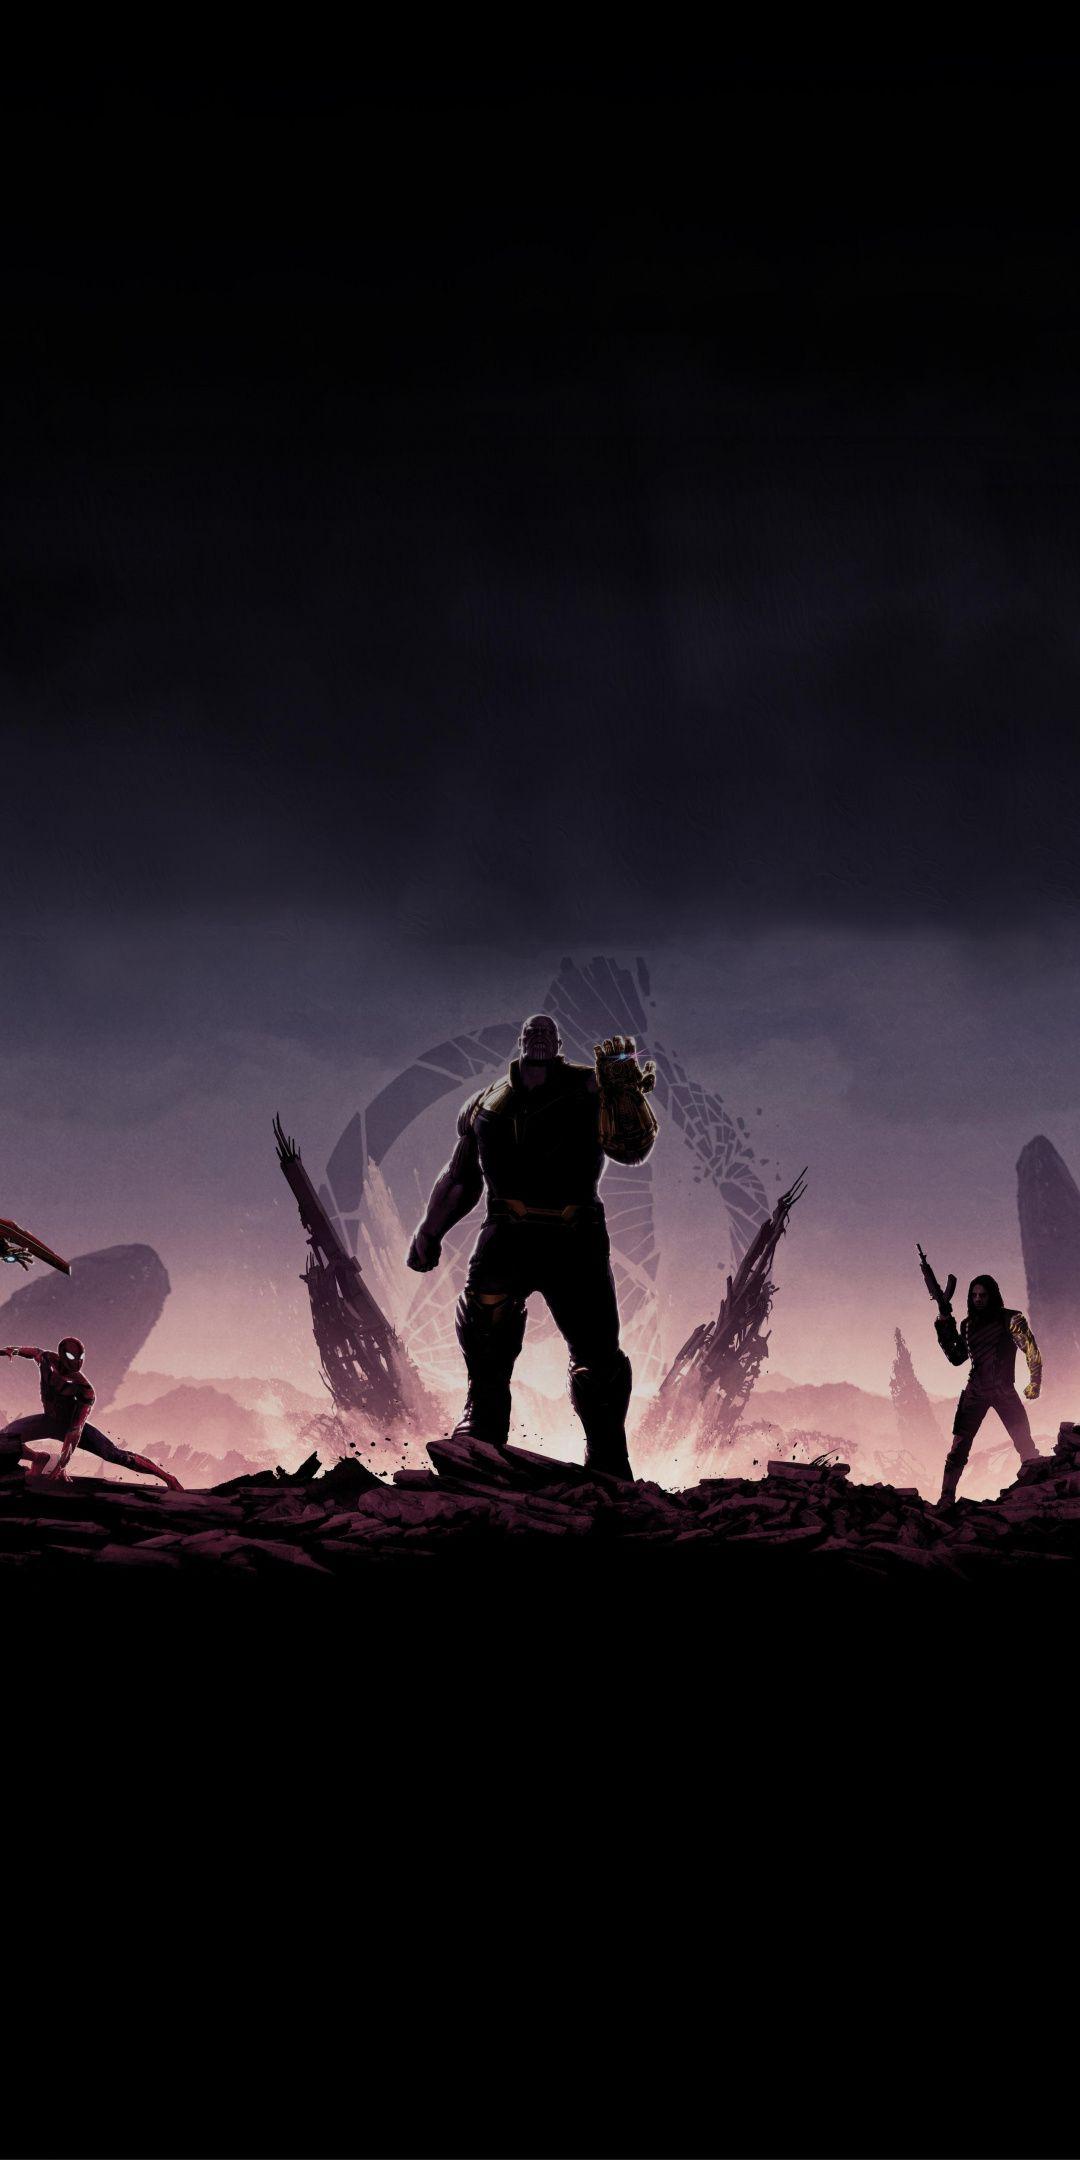 Unduh 8100 Koleksi Wallpaper 3d Thanos Gratis Terbaik